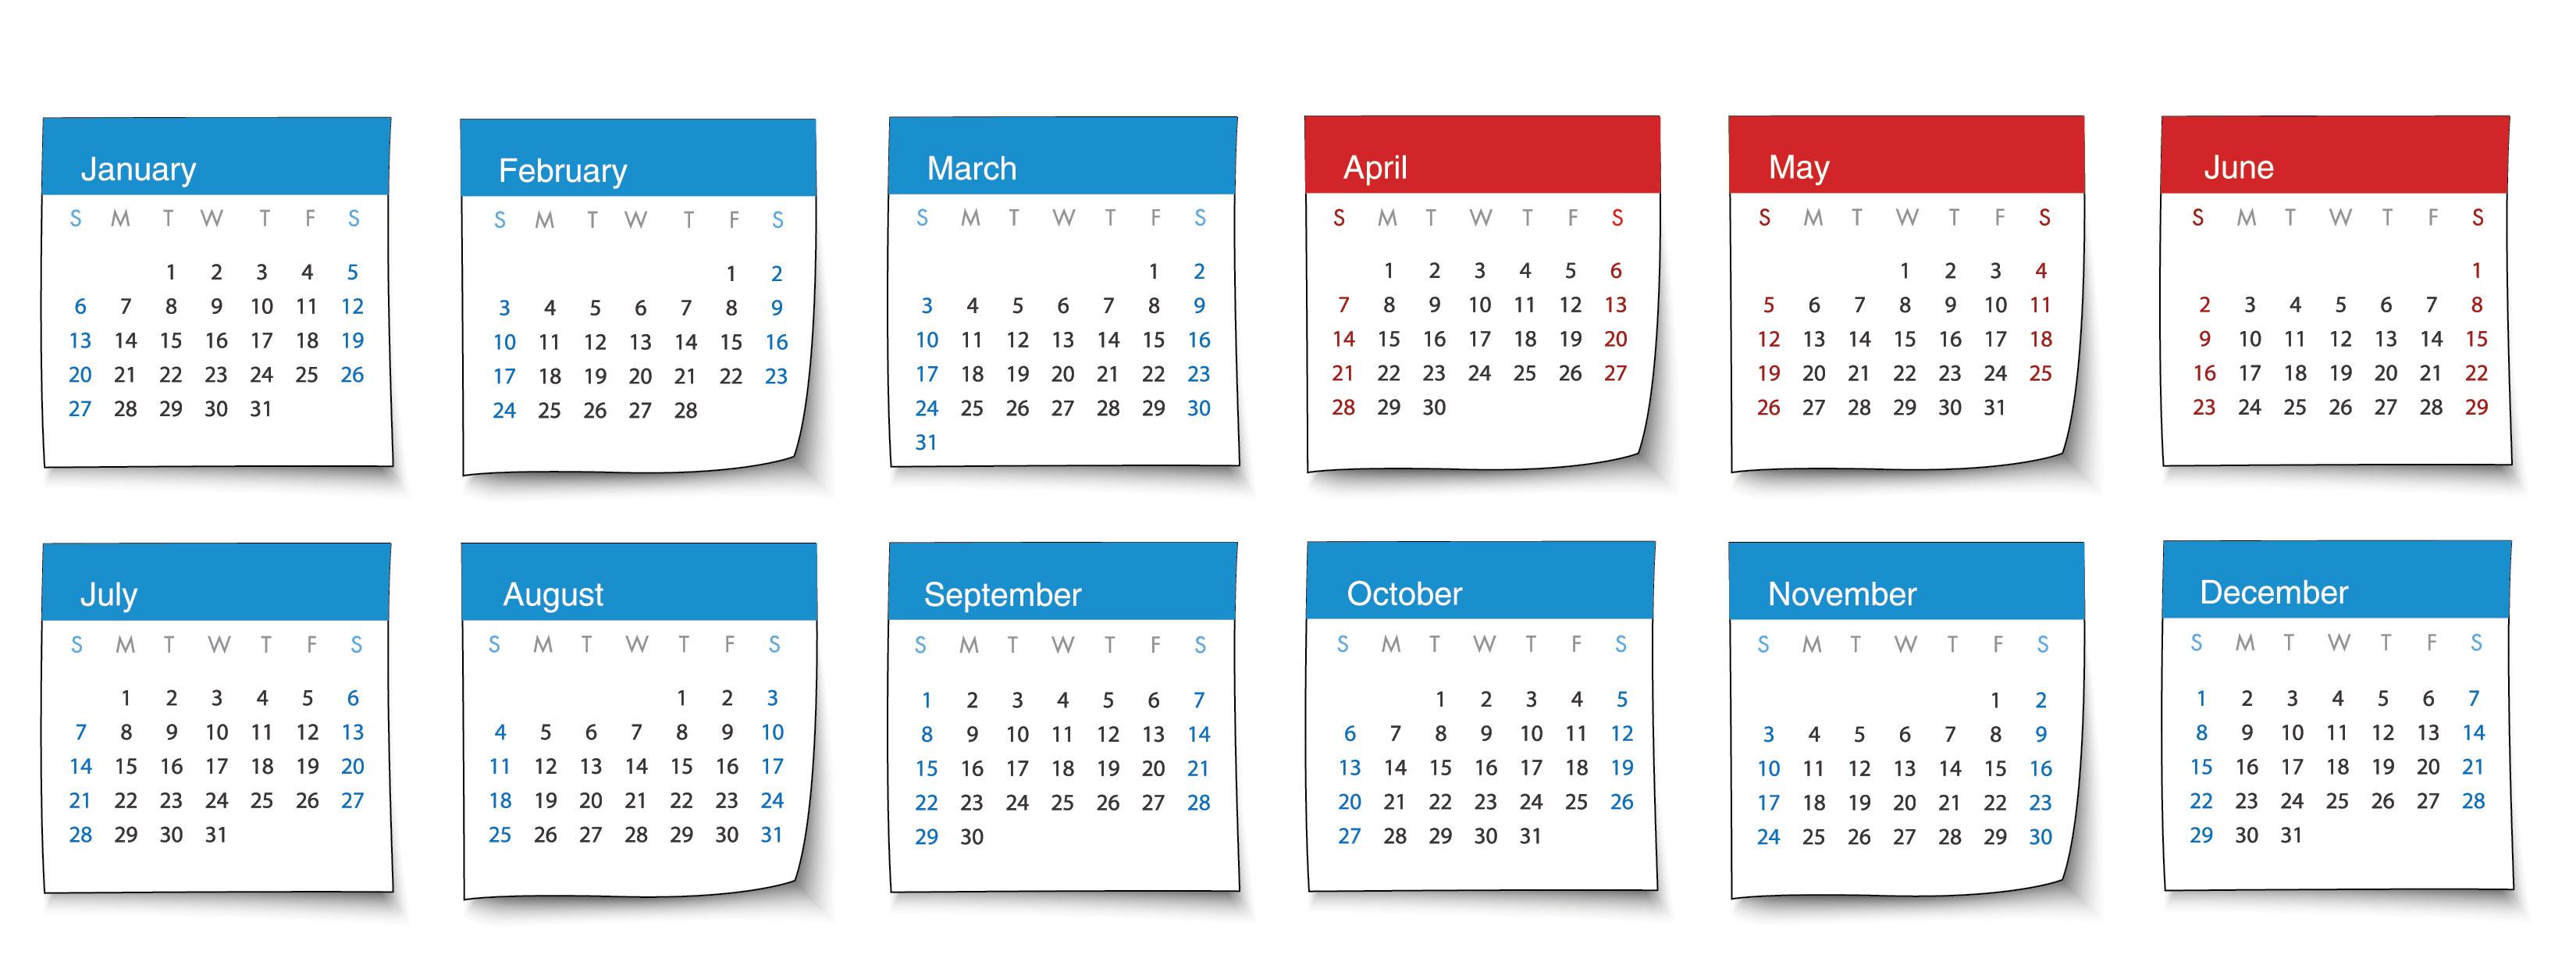 2019-02-11-Calendar-2019-ENG-MEM.jpg